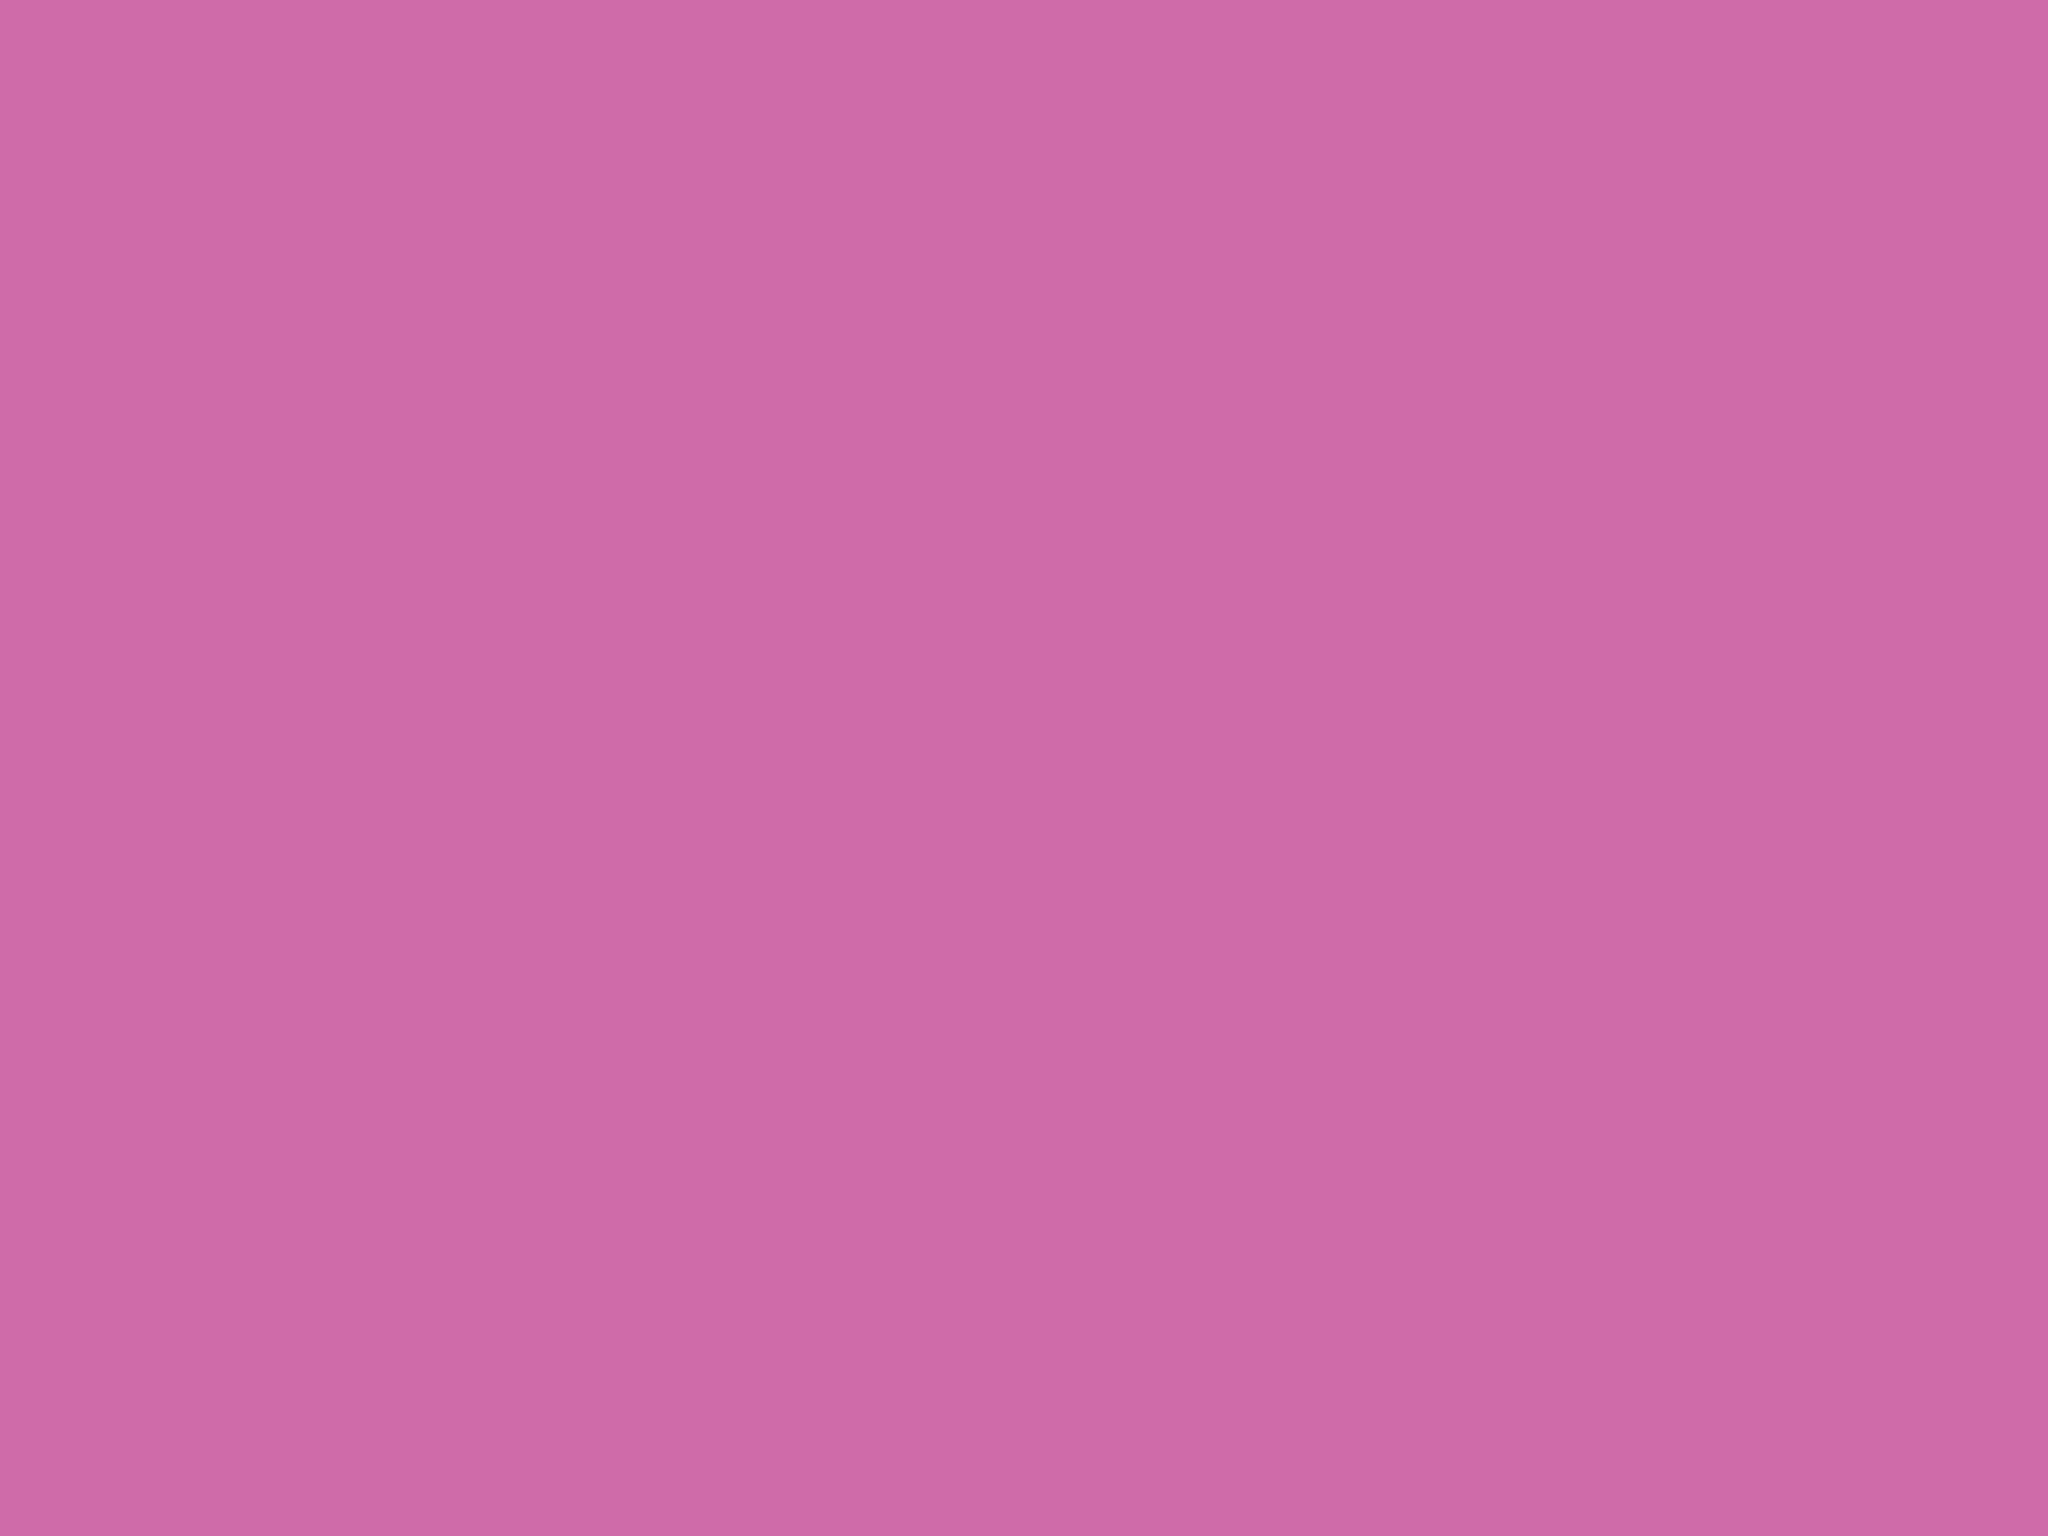 2048x1536 Super Pink Solid Color Background